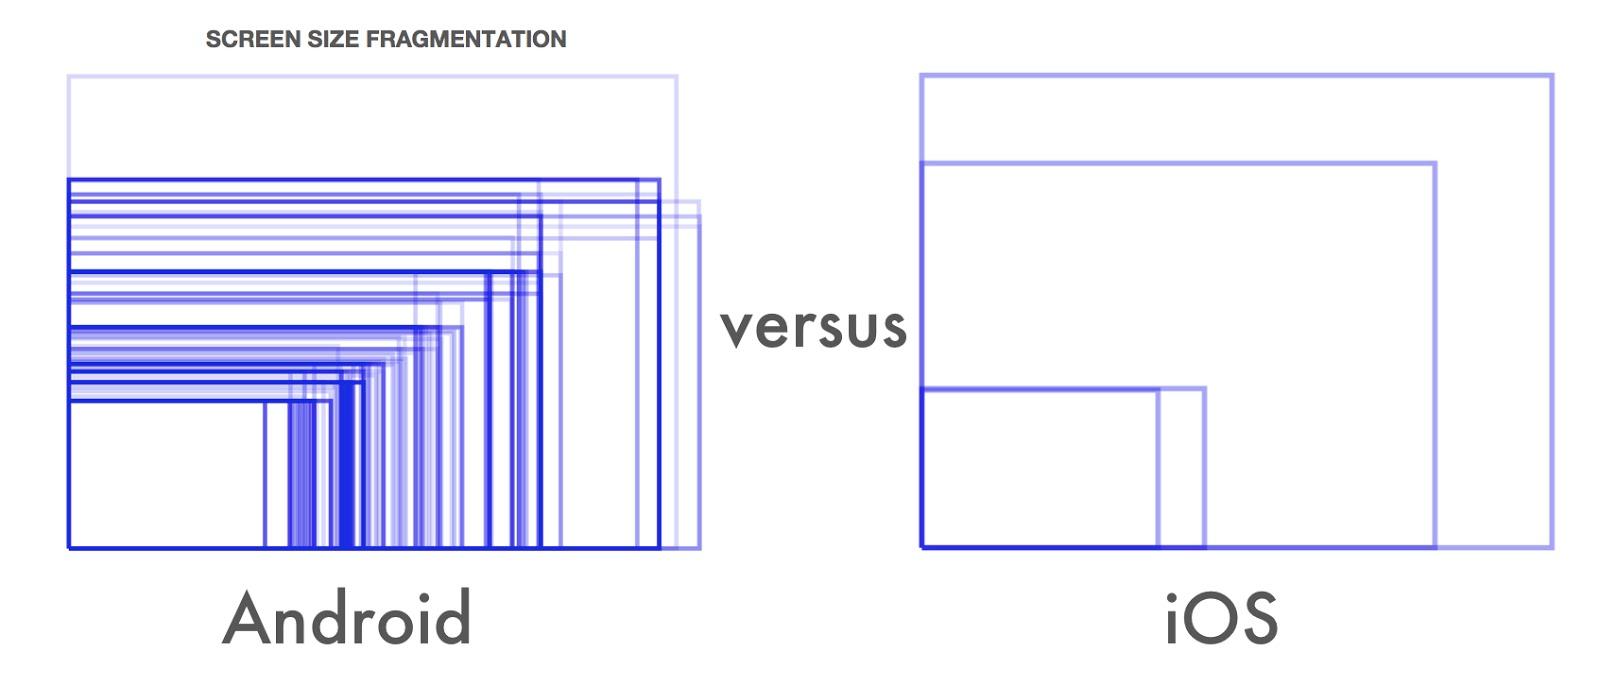 Android Design] ทำไมแอนดรอยด์ต้องใช้หน่วย DP? ~ Sleeping For Less